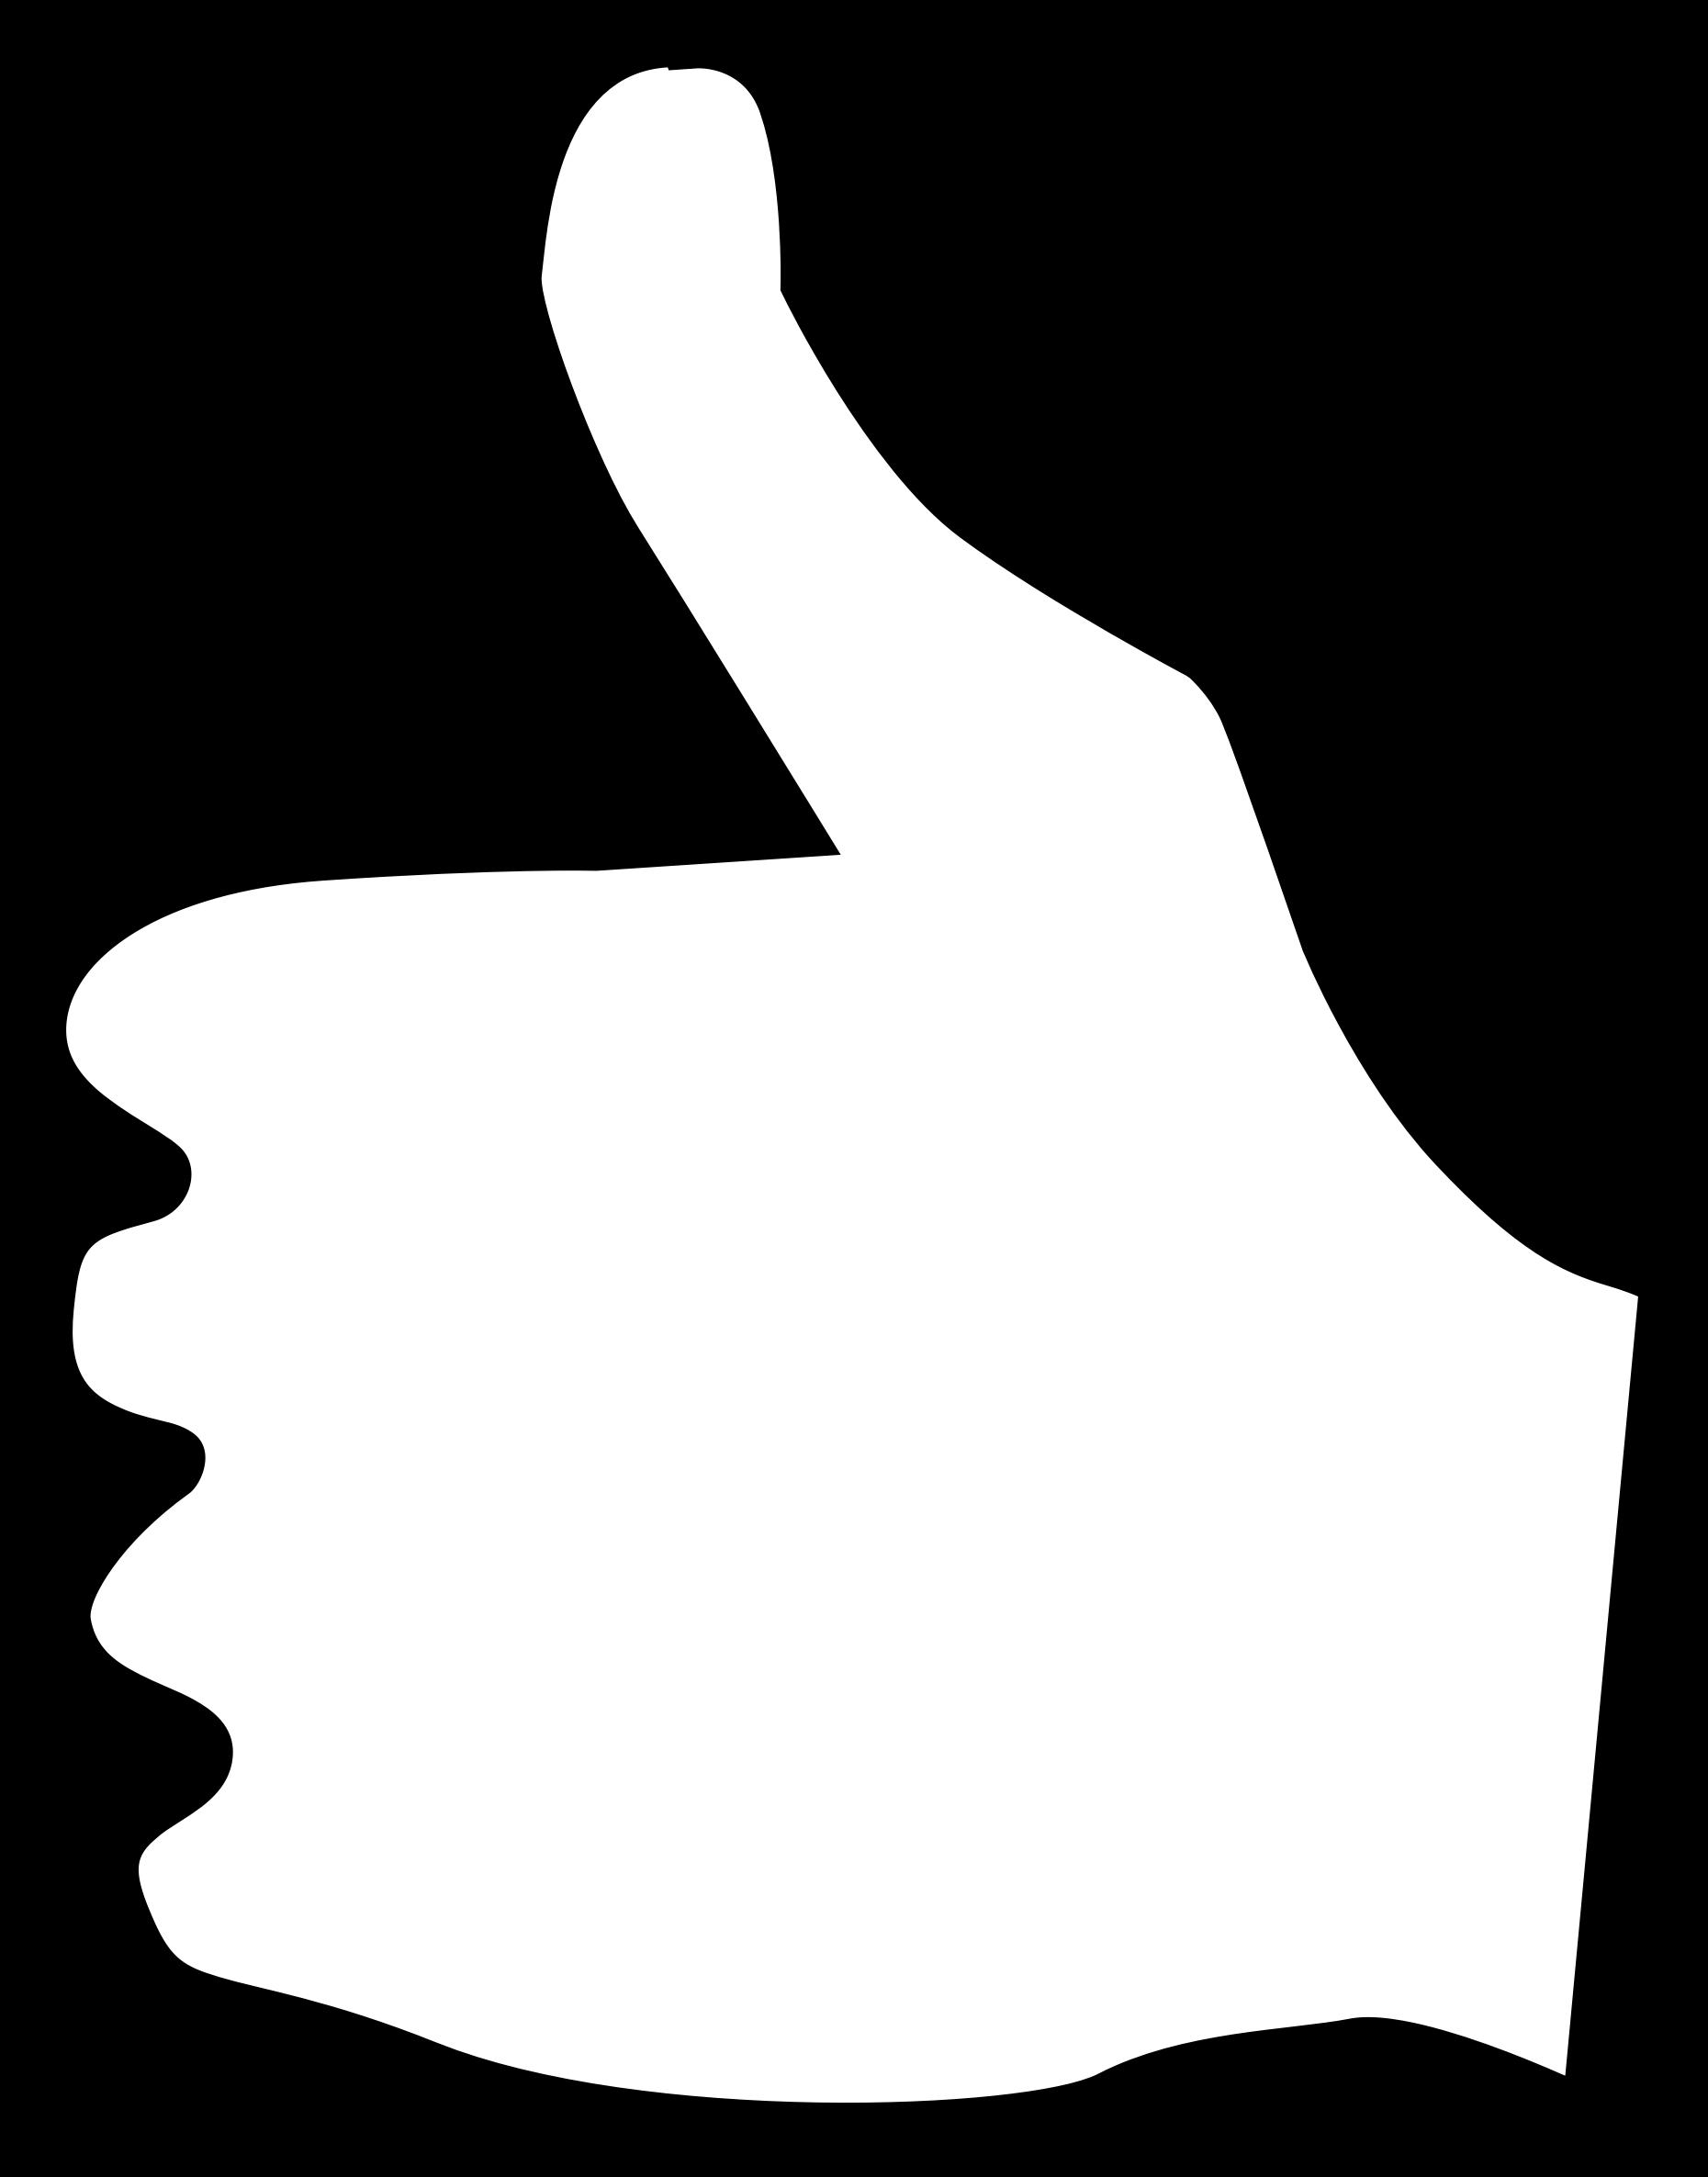 Thumbs Sideways Clipart.